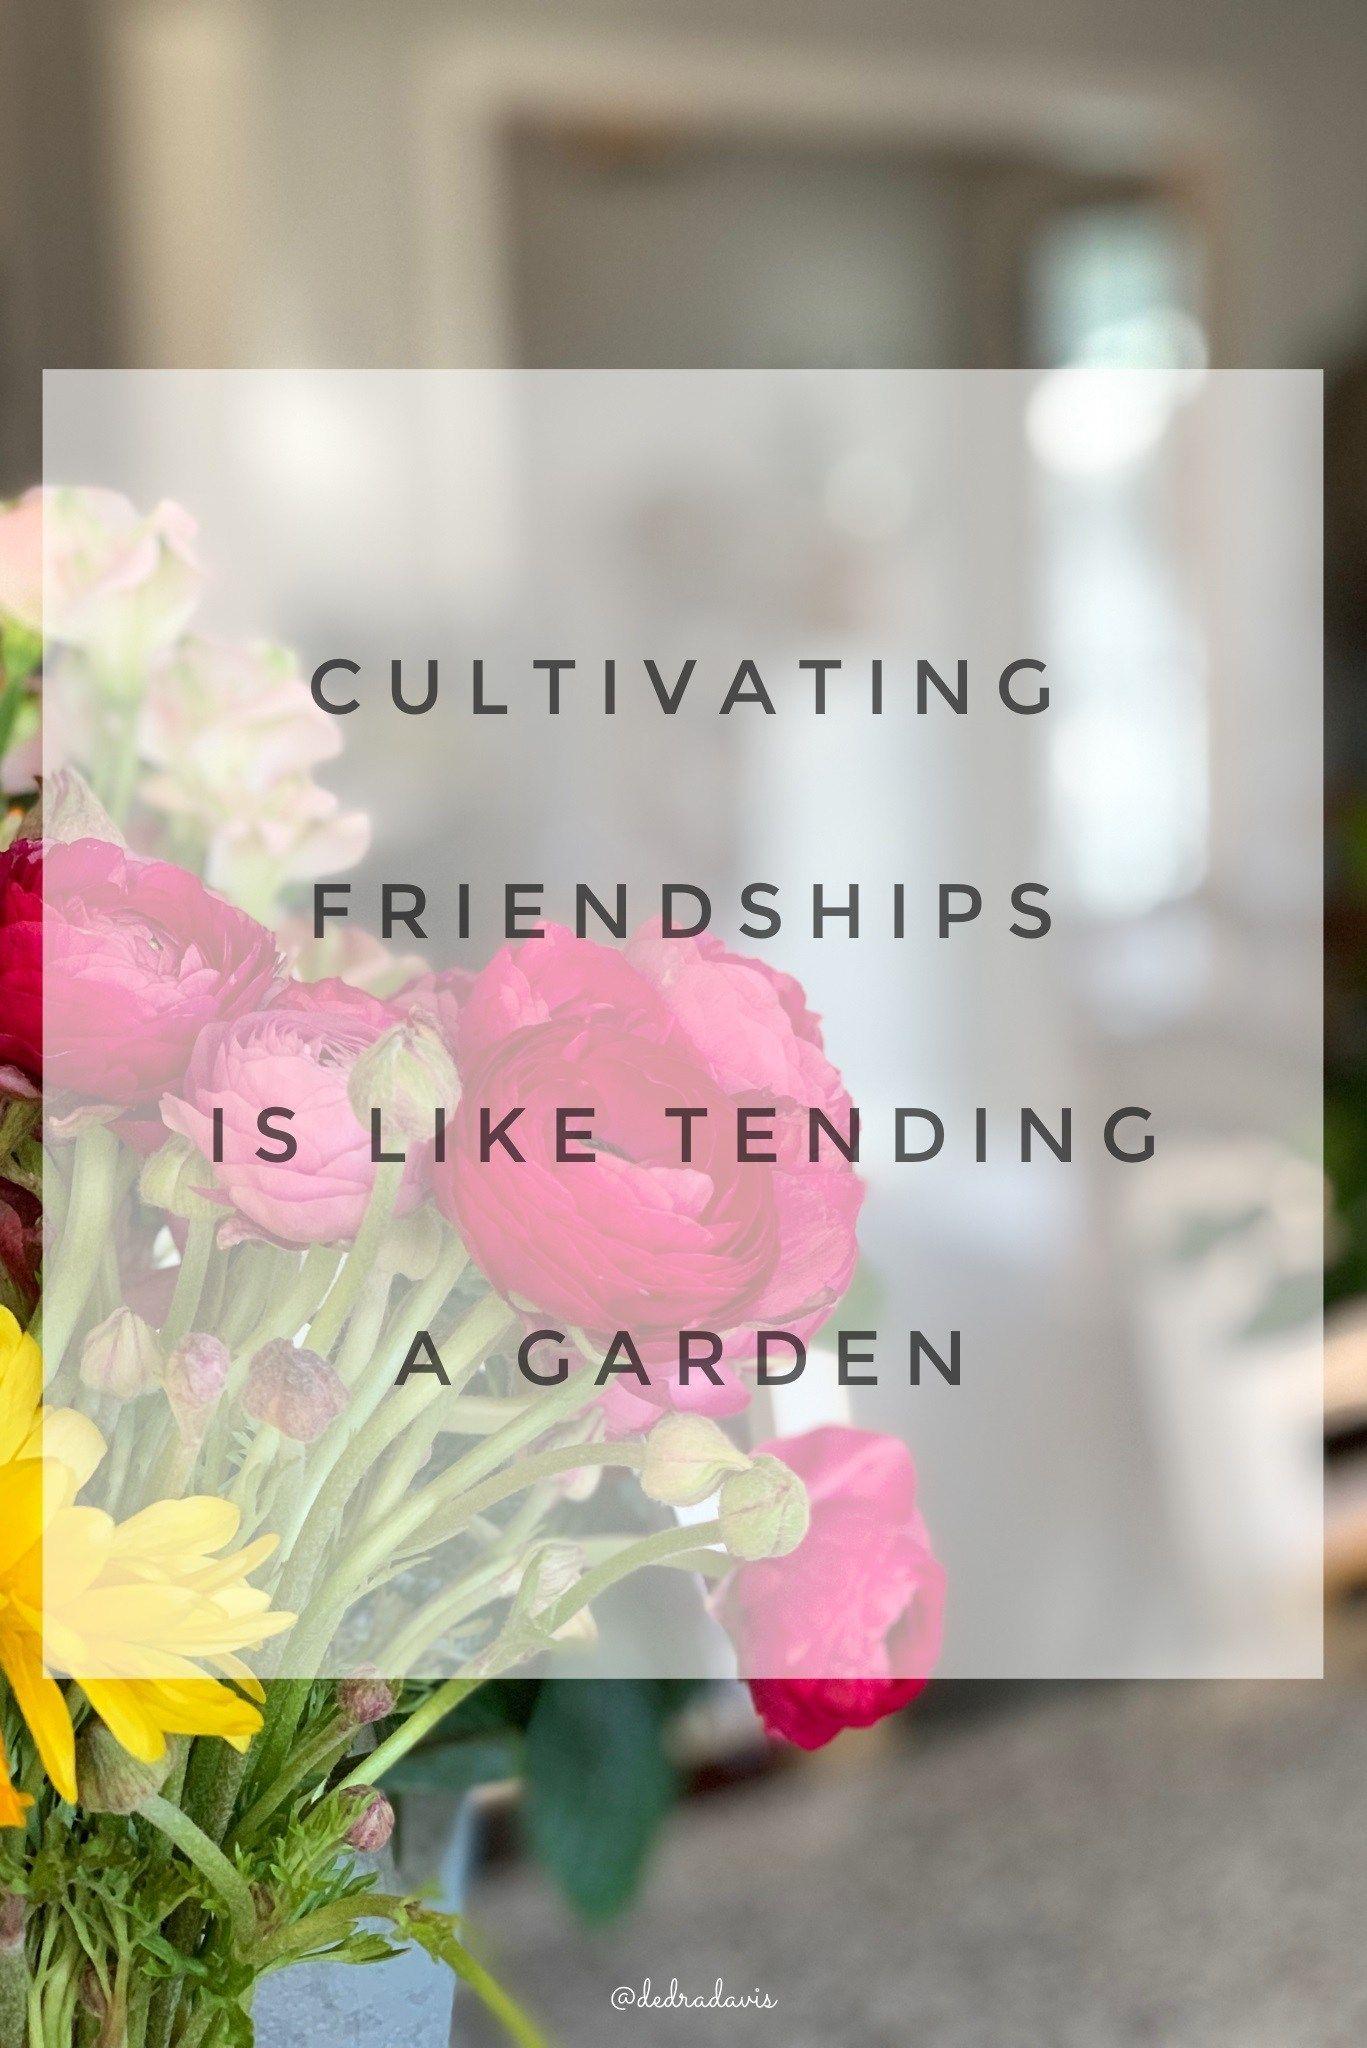 Cultivating Friendships Is Like Tending A Garden